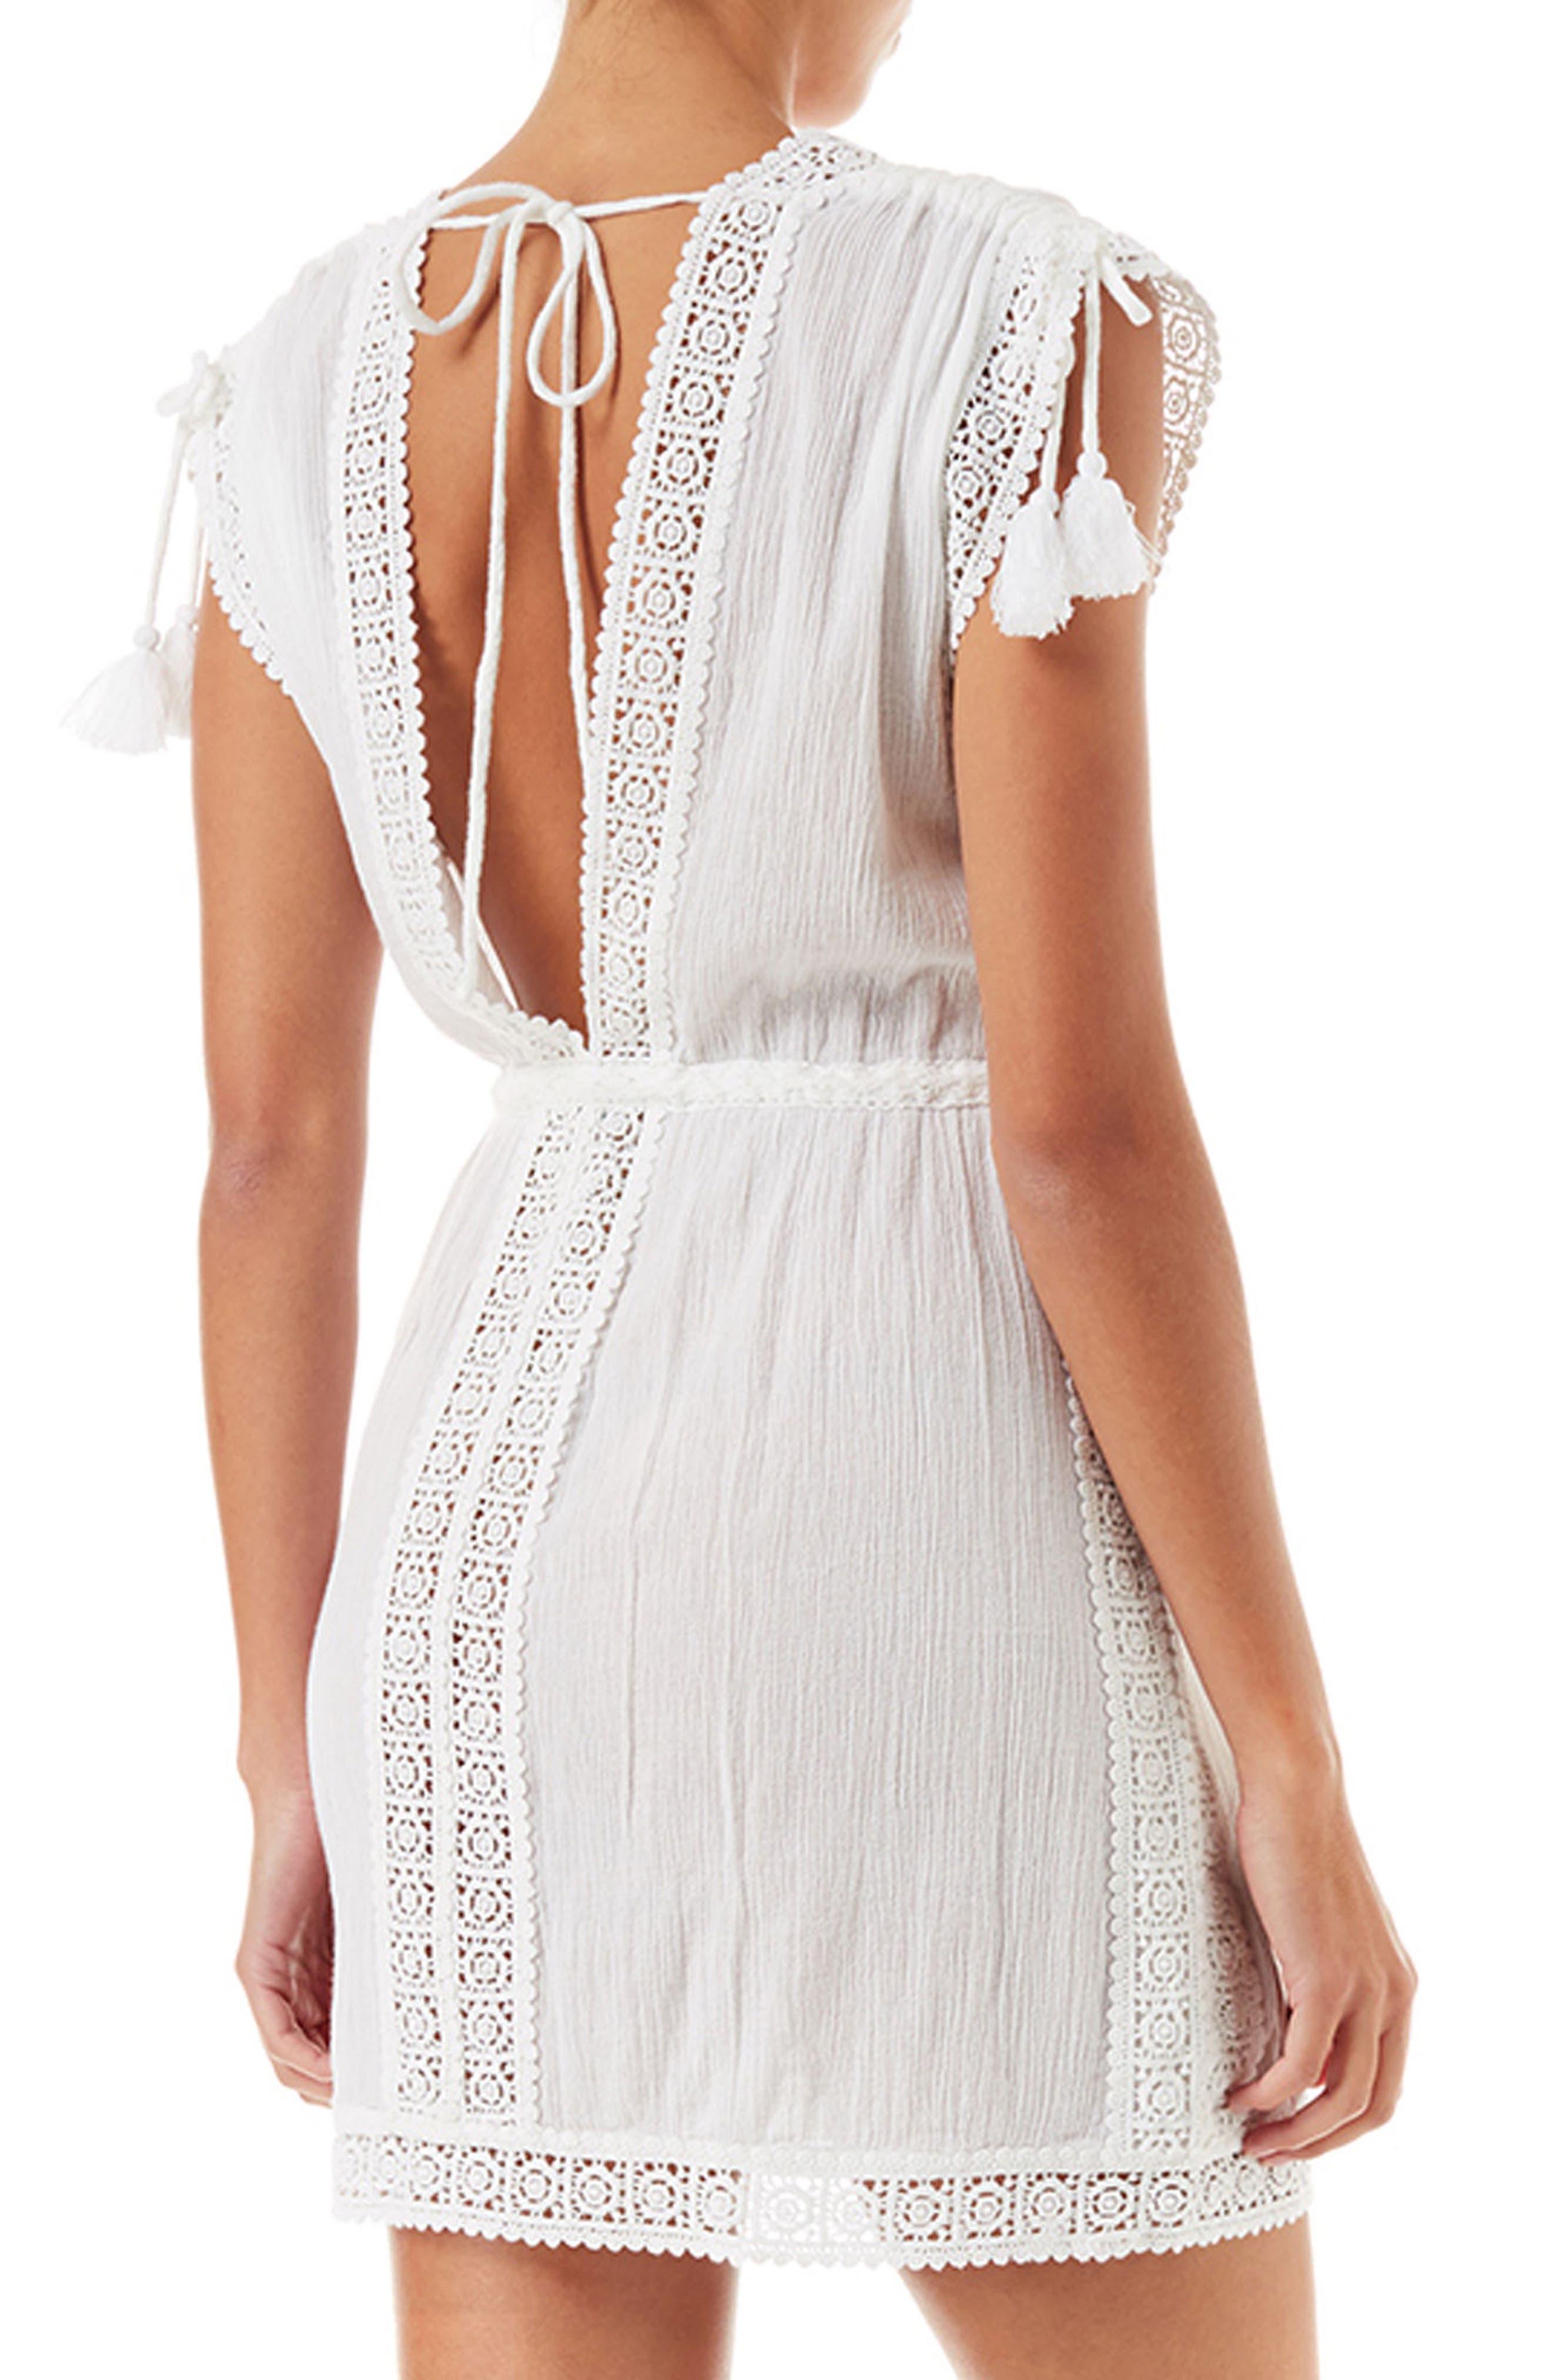 Jennifer Cover-up Dress,                             Alternate thumbnail 2, color,                             White